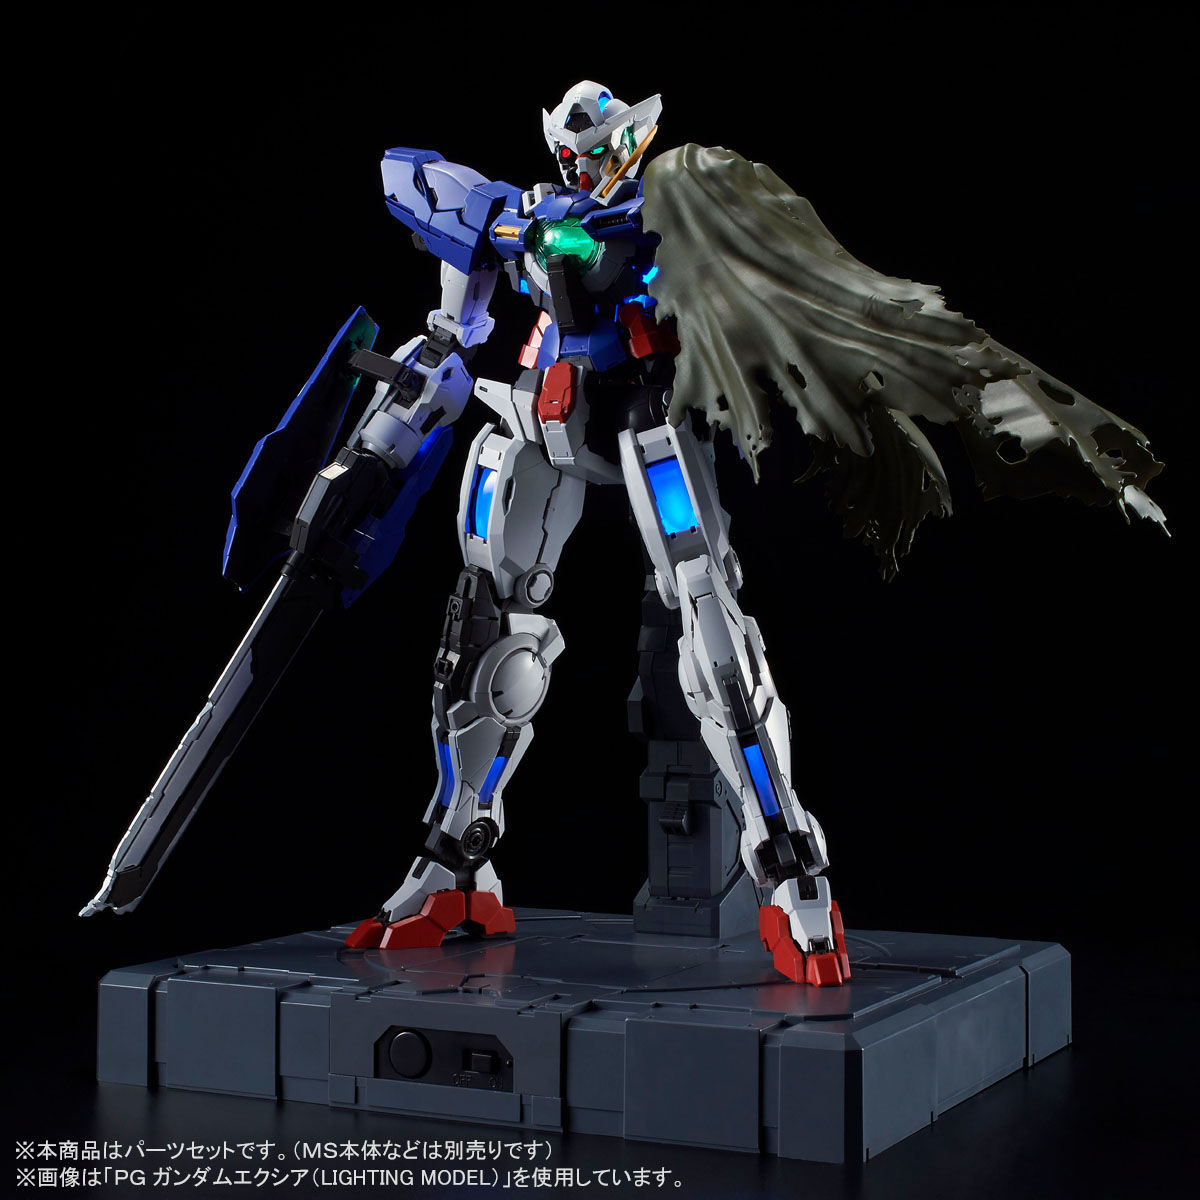 PG 1/60 ガンダムエクシア用リペアパーツセット [Repair Parts Set For Gundam Exia]